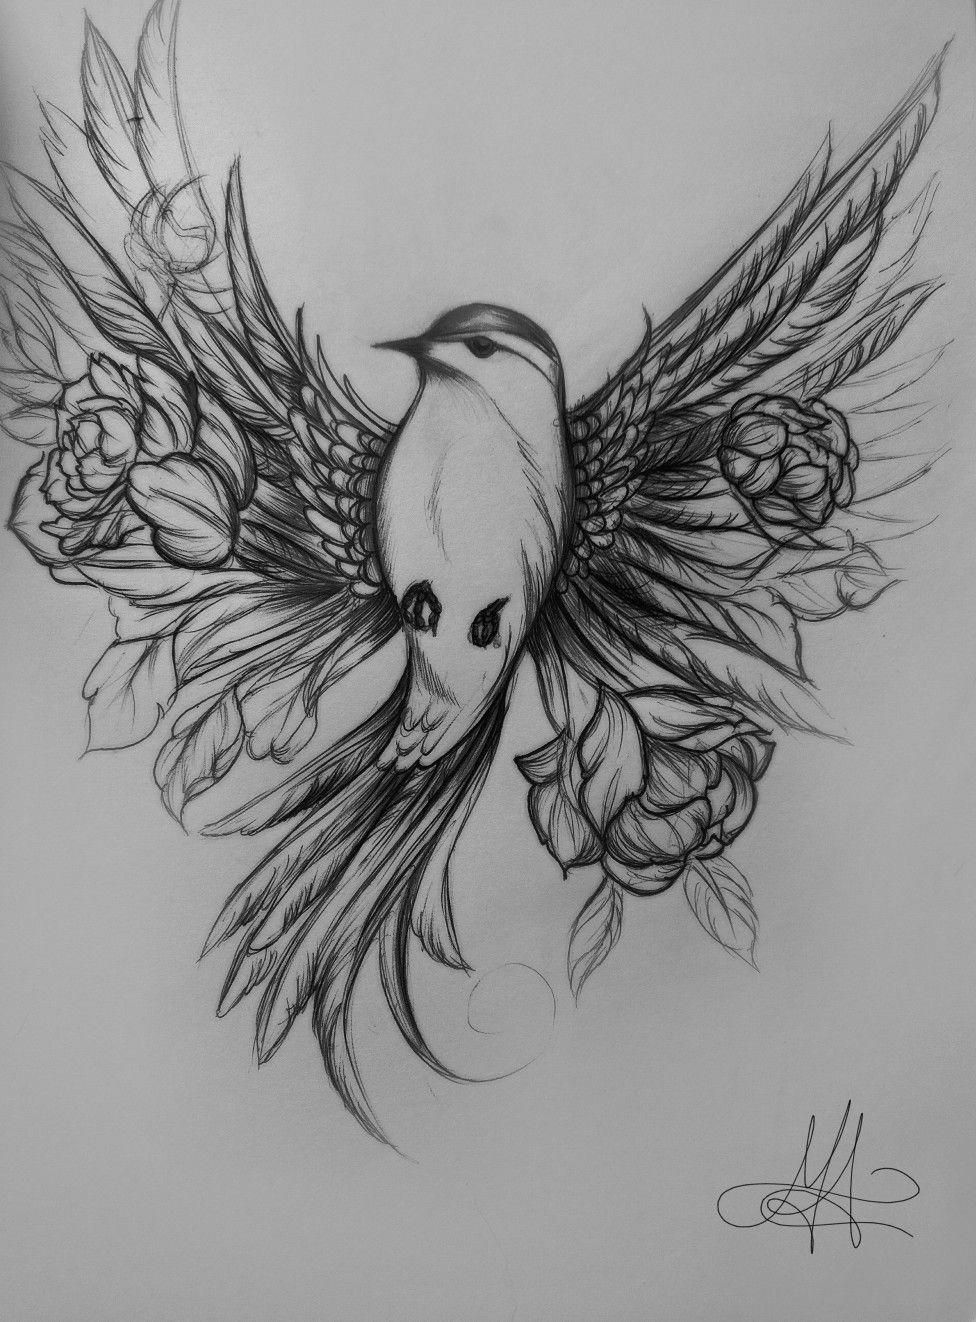 Illustrative Tattoo Designs By Ien Levin Creepy Tattoos Picture Tattoos Body Art Tattoos